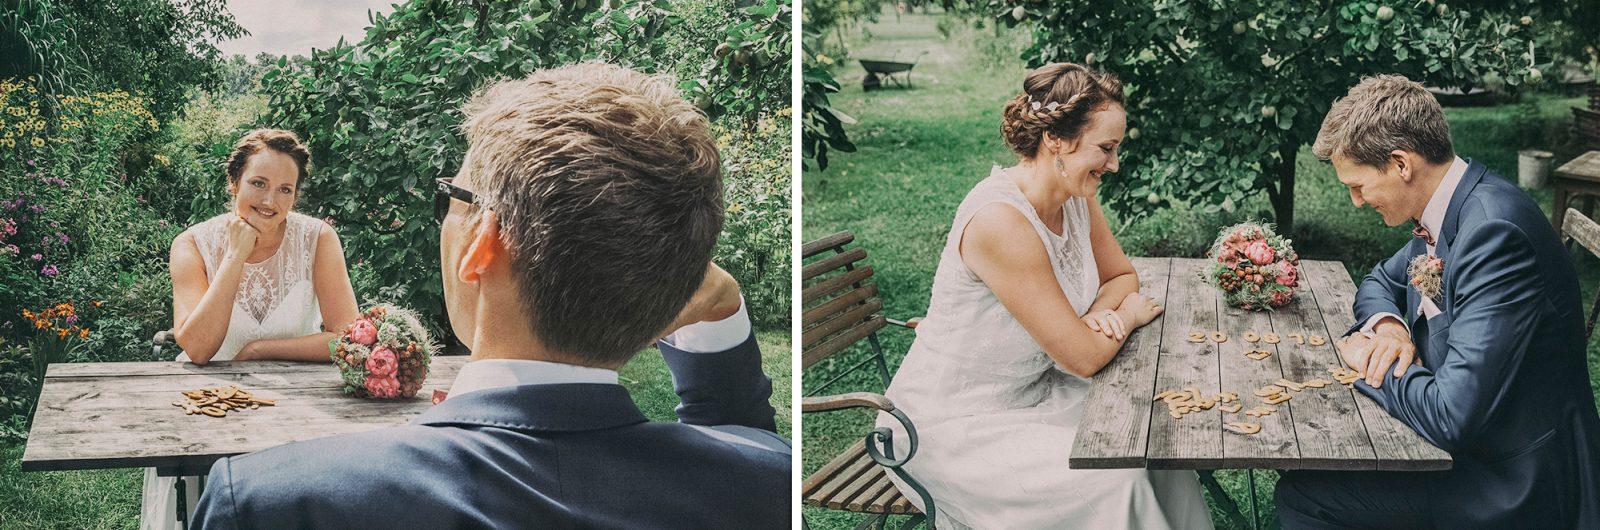 Hochzeit_Potsdam_fotograf_G152